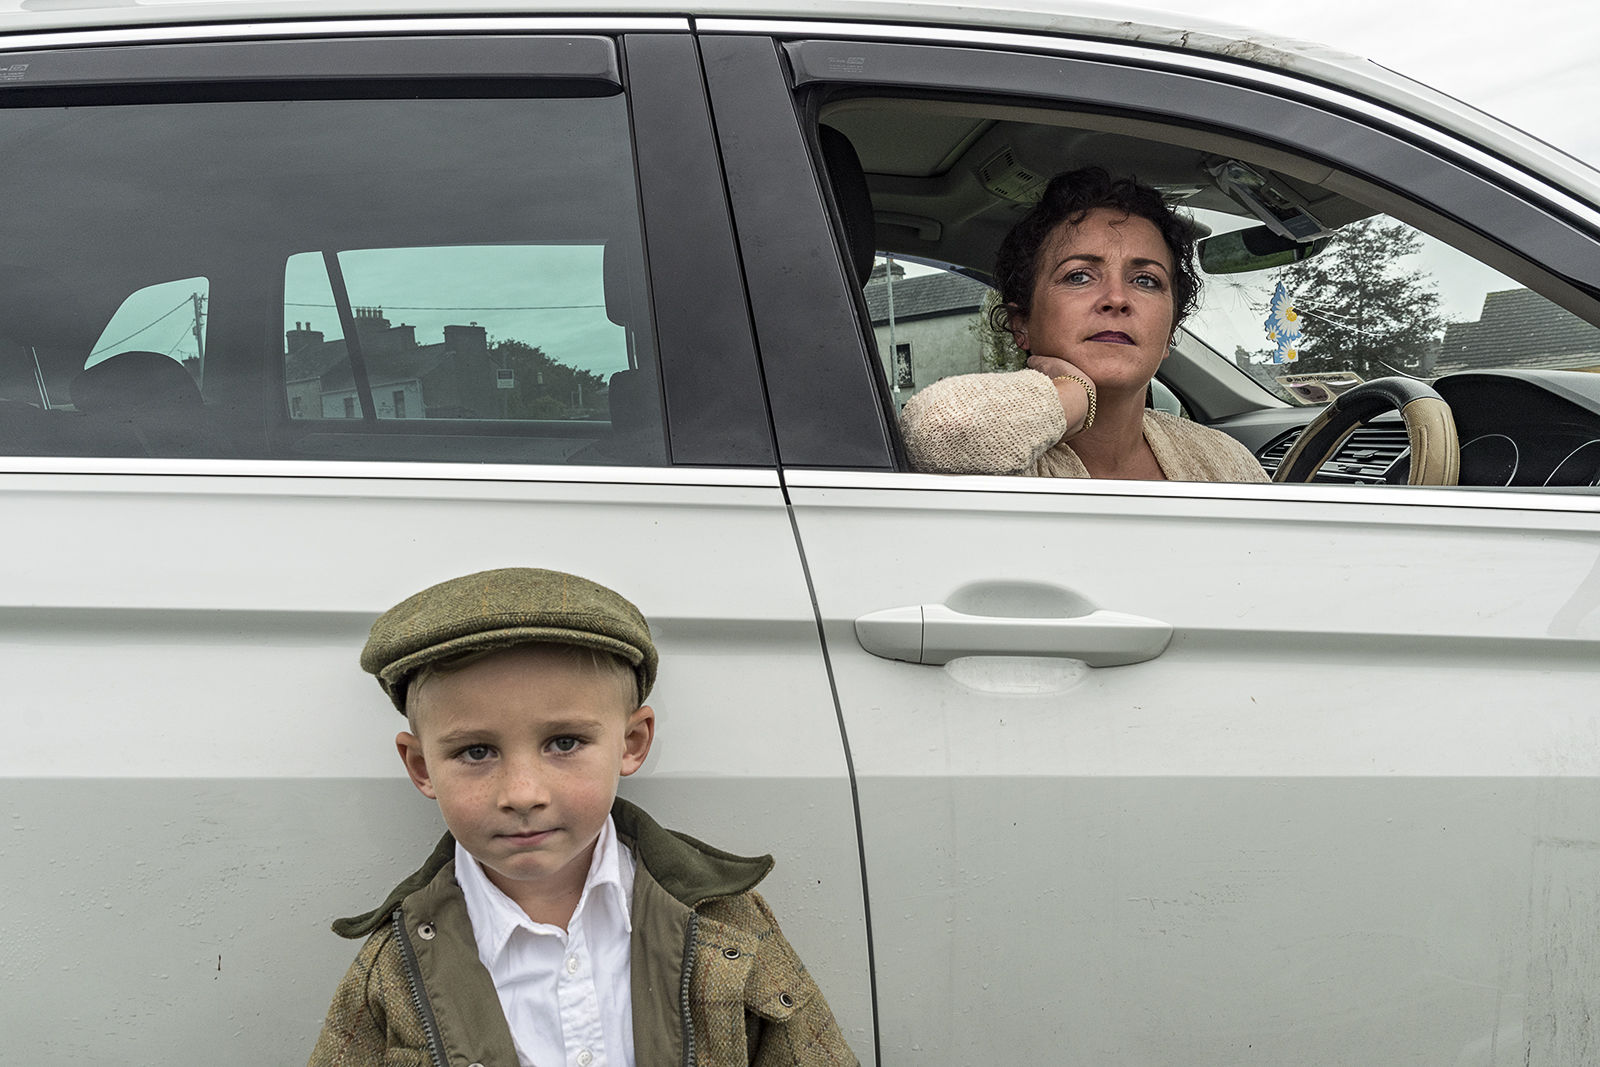 Mother and Son, Ballinasloe Horse Fair, Galway, Ireland 2019